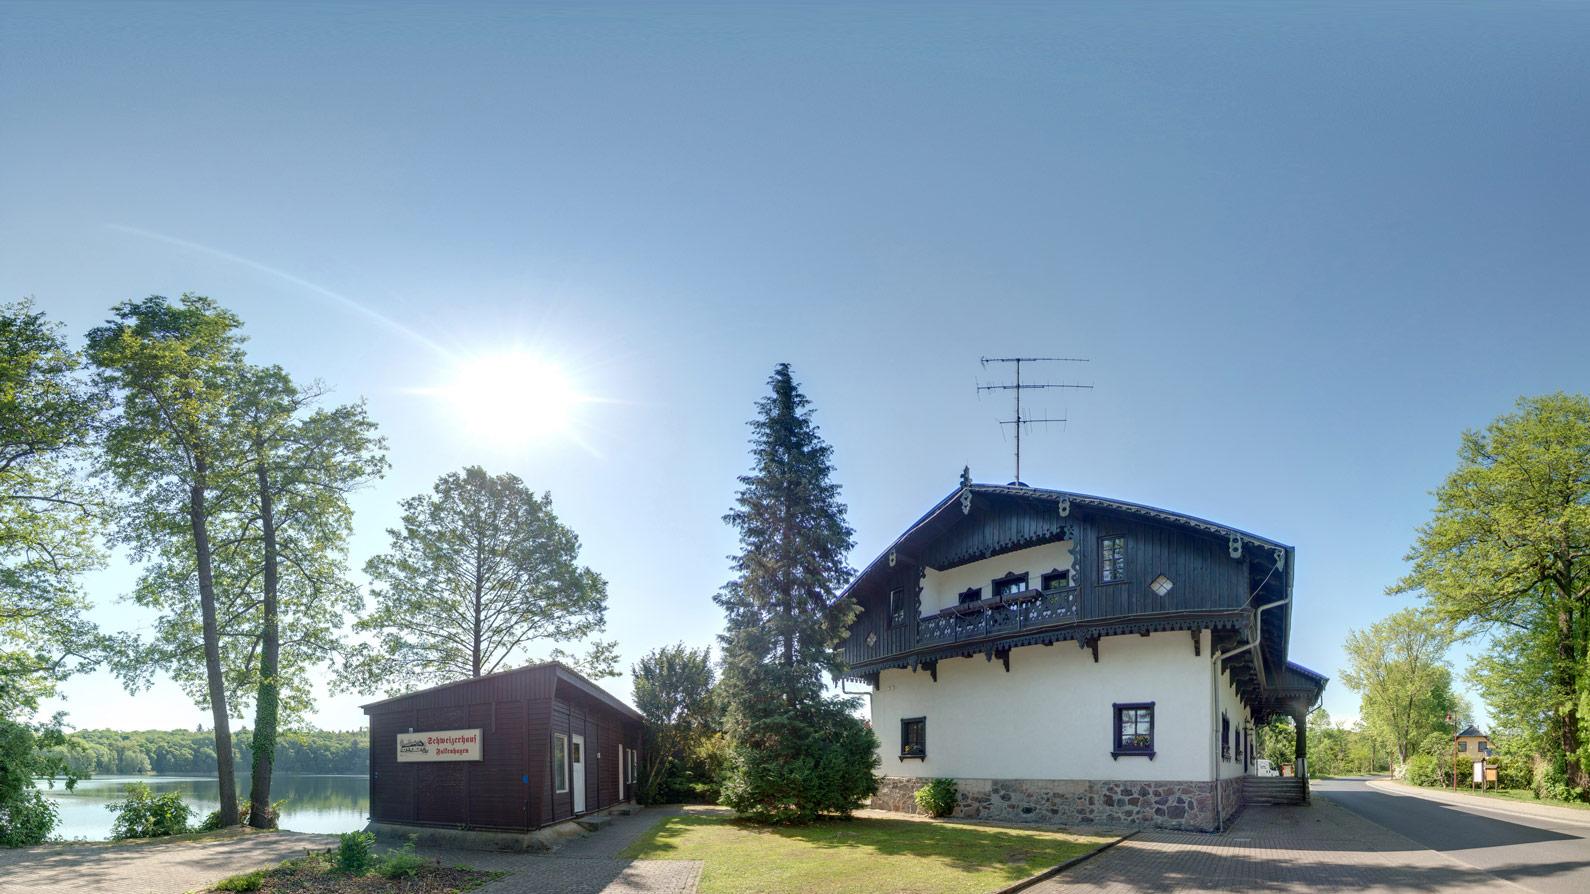 DSC_5419-Panorama-Panorama-klein